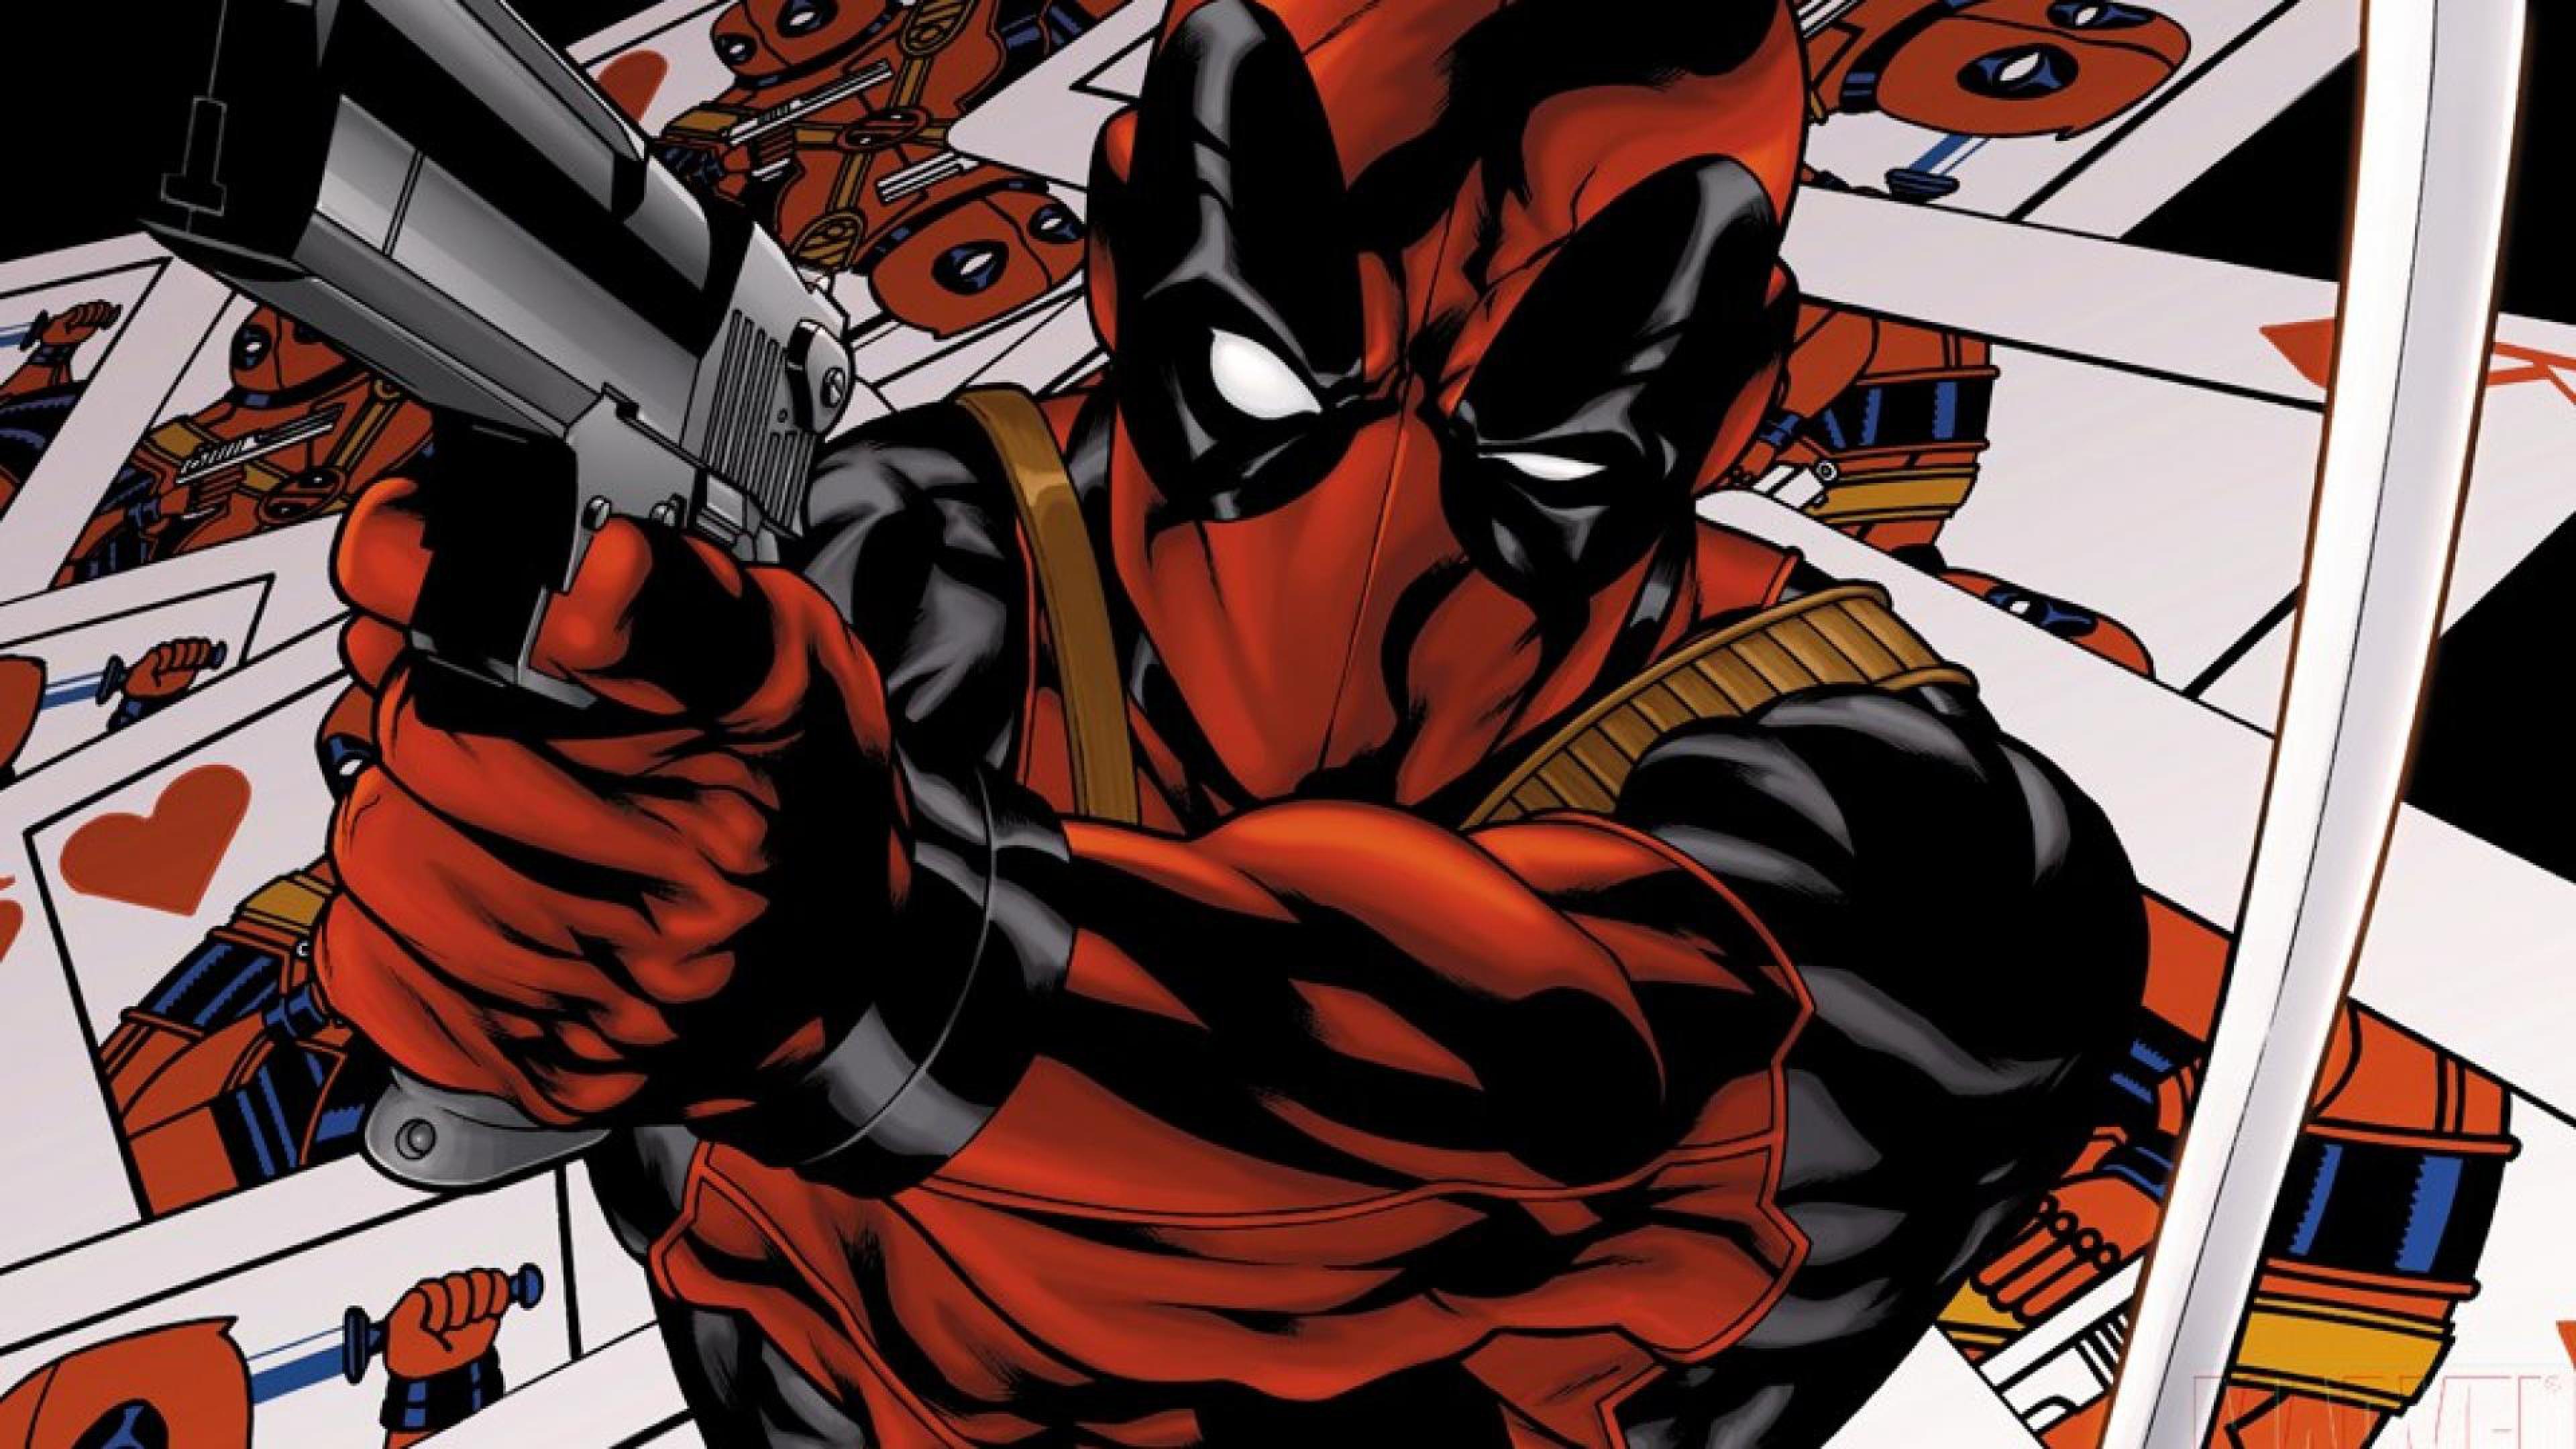 The new mutants Marvel comics Wallpaper Background 4K Ultra HD 3840x2160